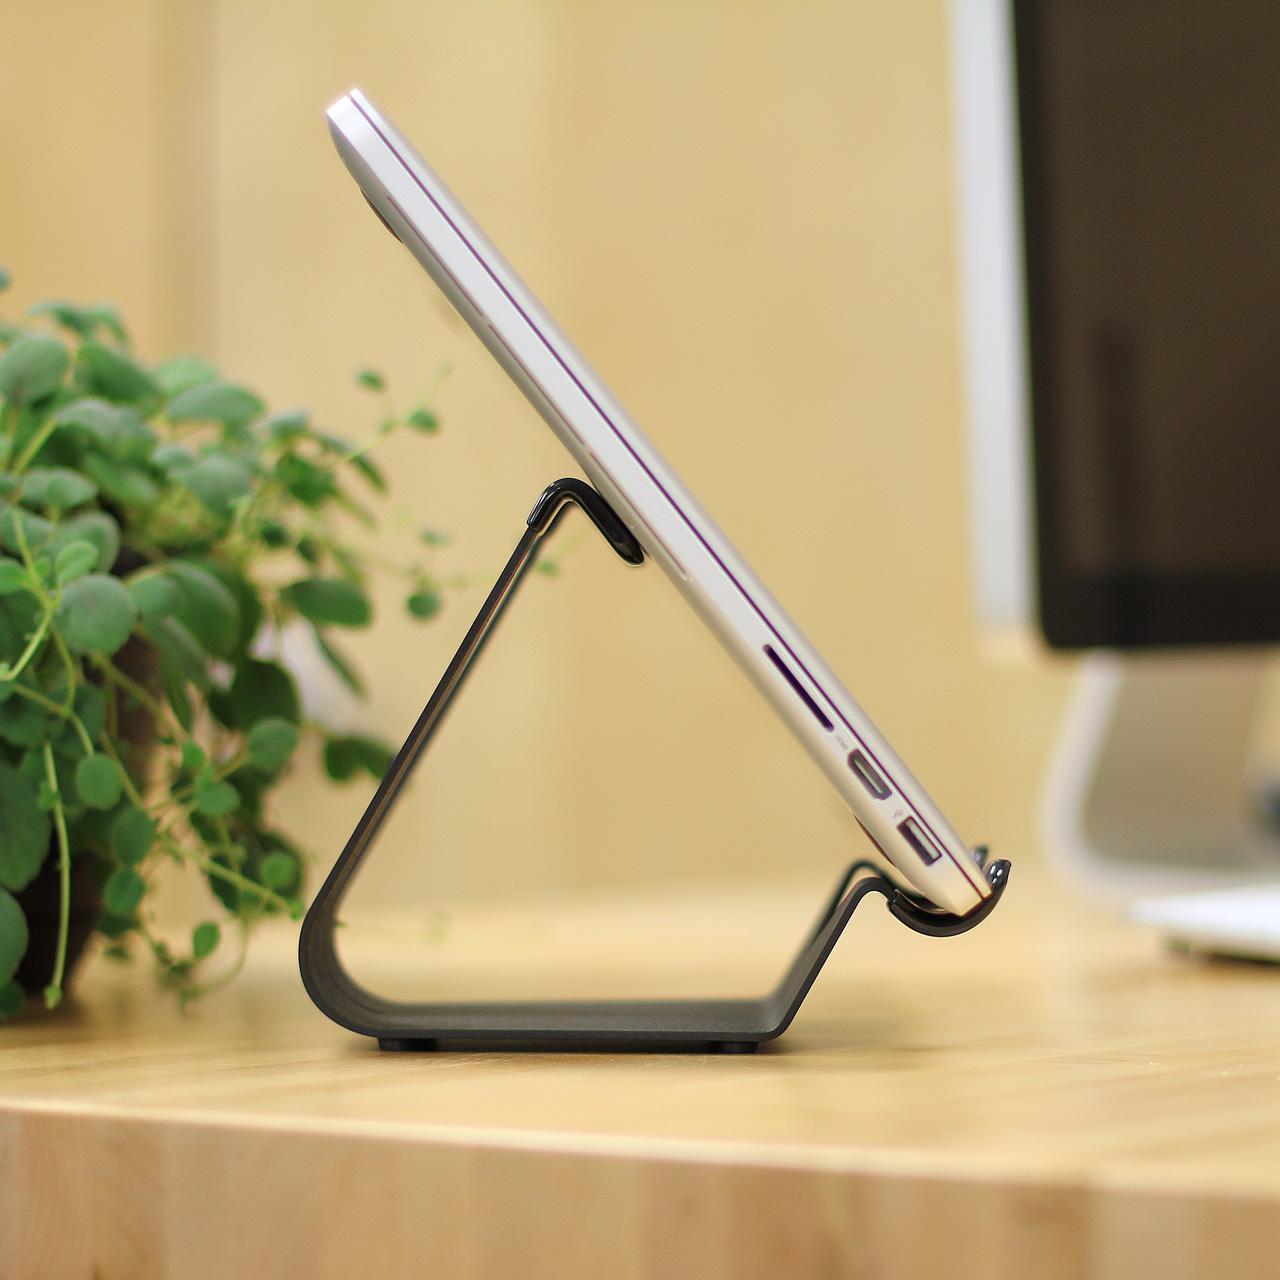 Laptop Stand - 15 Inch Laptops & Smaller - All MacBook Pro, MacBook, MacBook Air & More